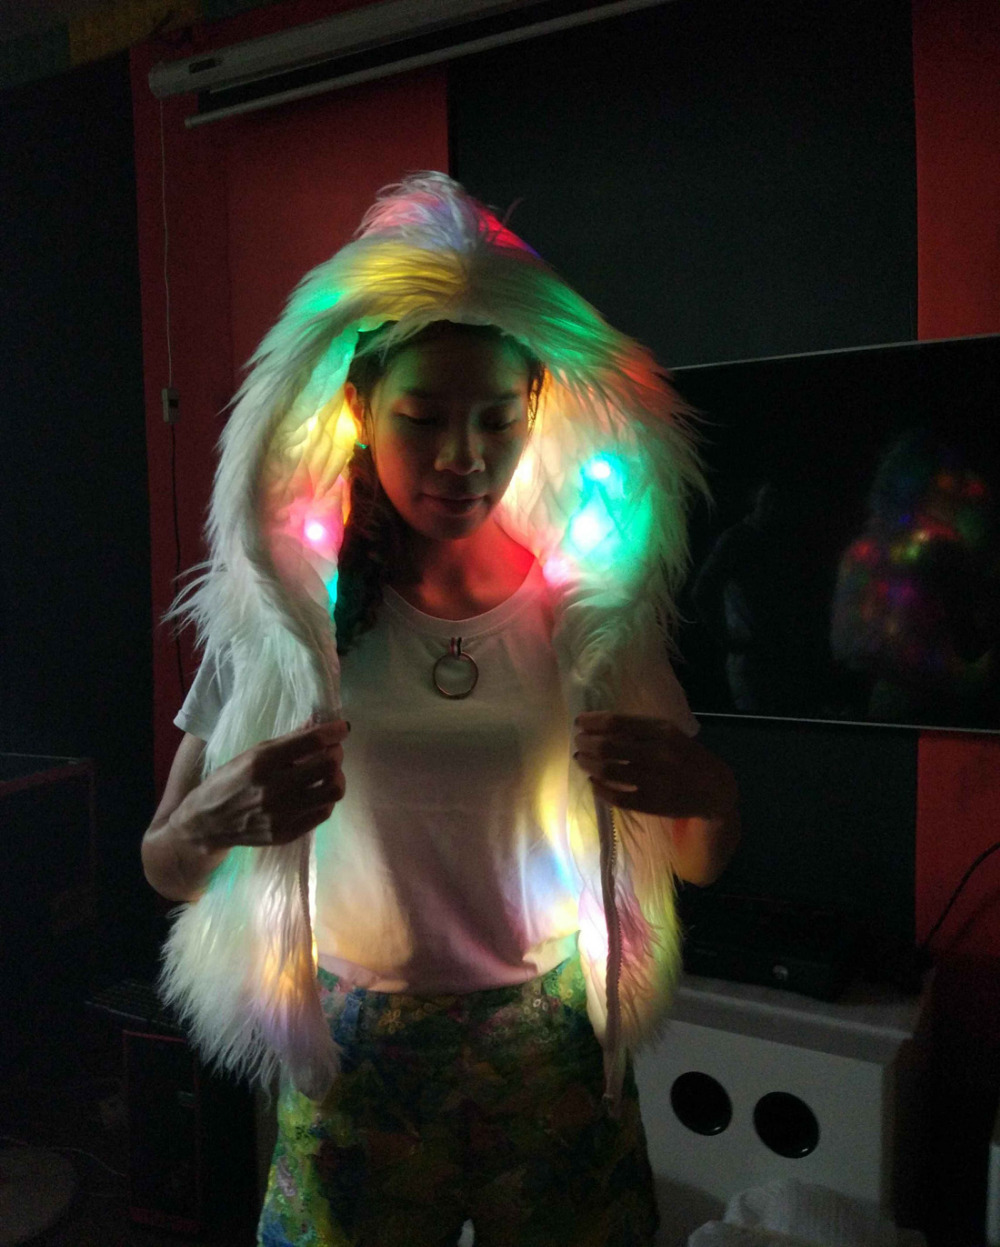 NIHUA Womens Faux Fur LED Vest Light Up Rave Hoodies Gilets Jacket Cat Ears Xmas Birthday Party Fancy Dress